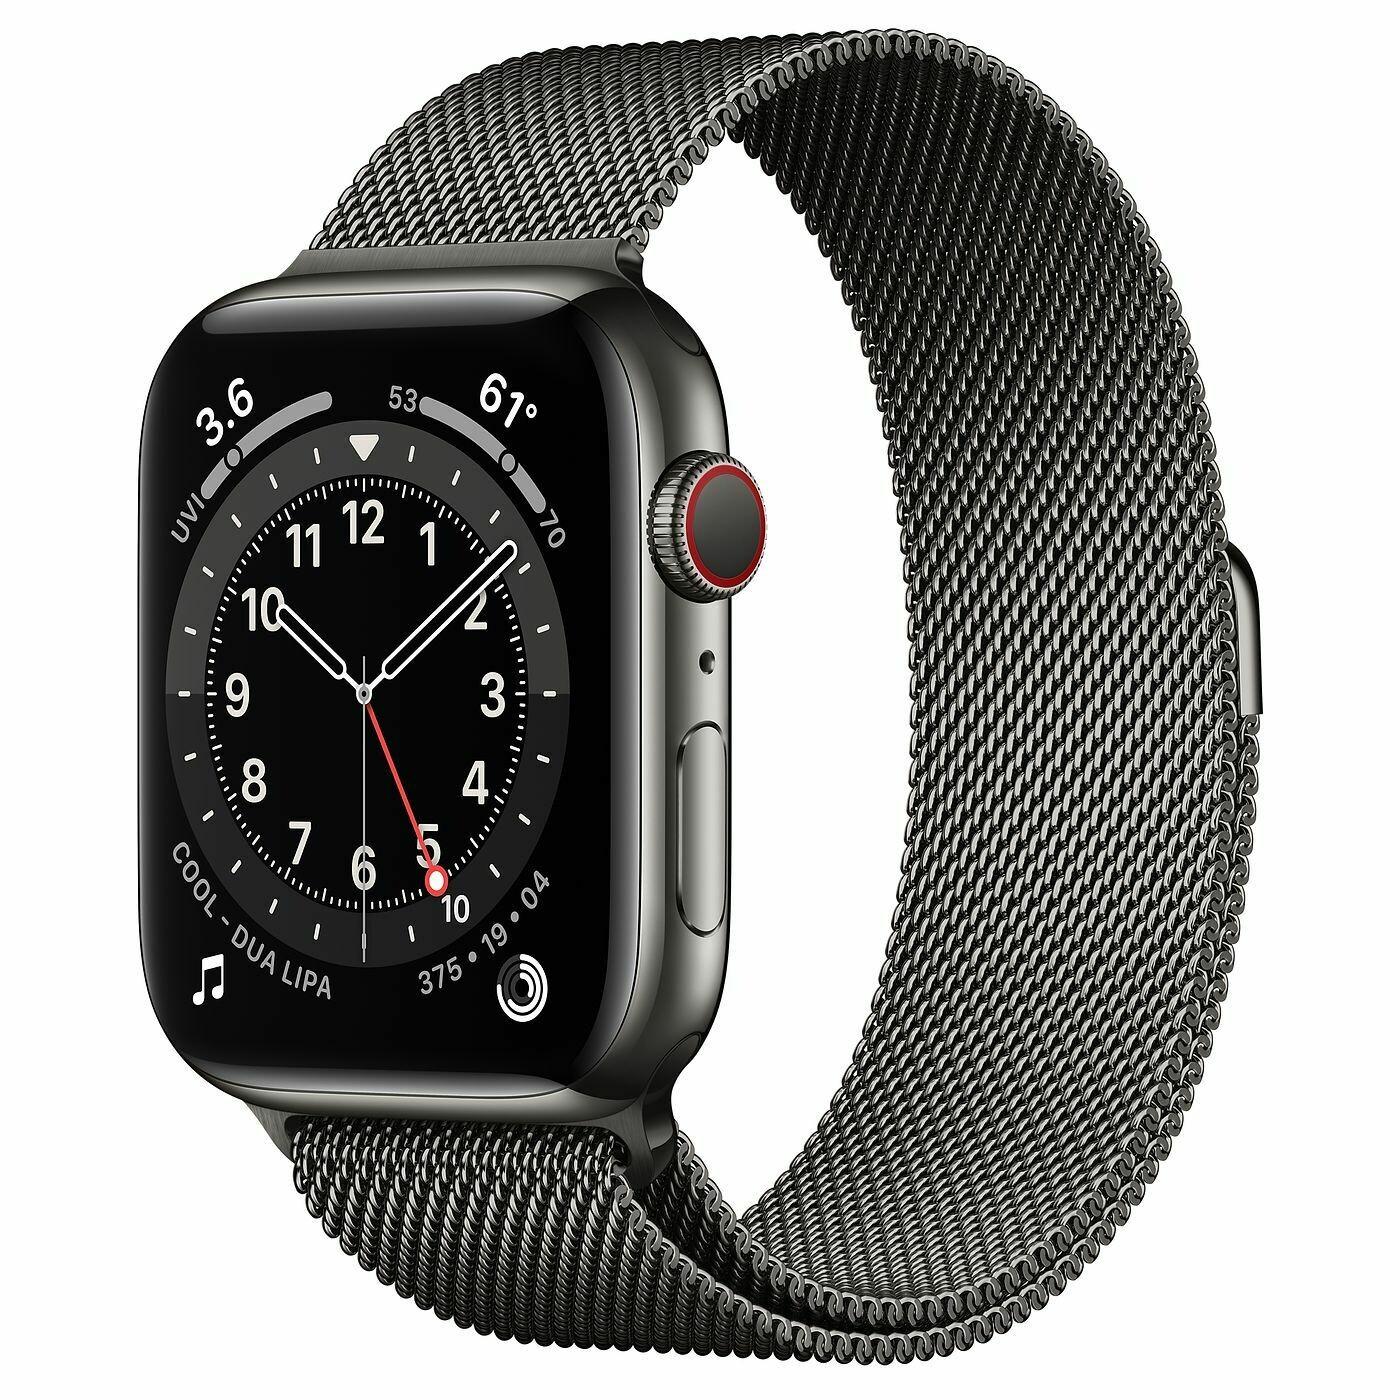 Часы Apple Watch Series 6 GPS + Cellular 44mm Stainless Steel Case with Milanese Loop (Графитовый)